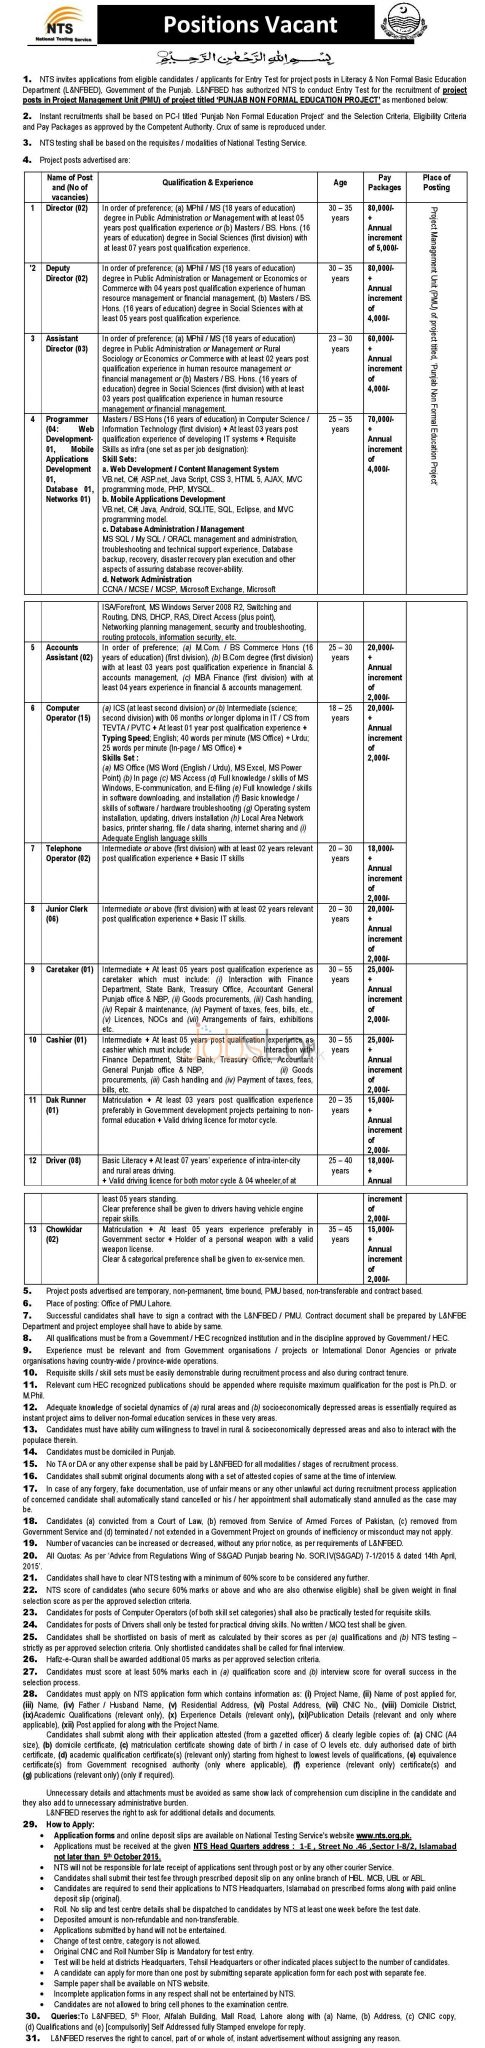 Literacy & Non Formal Basic Education Department Jobs